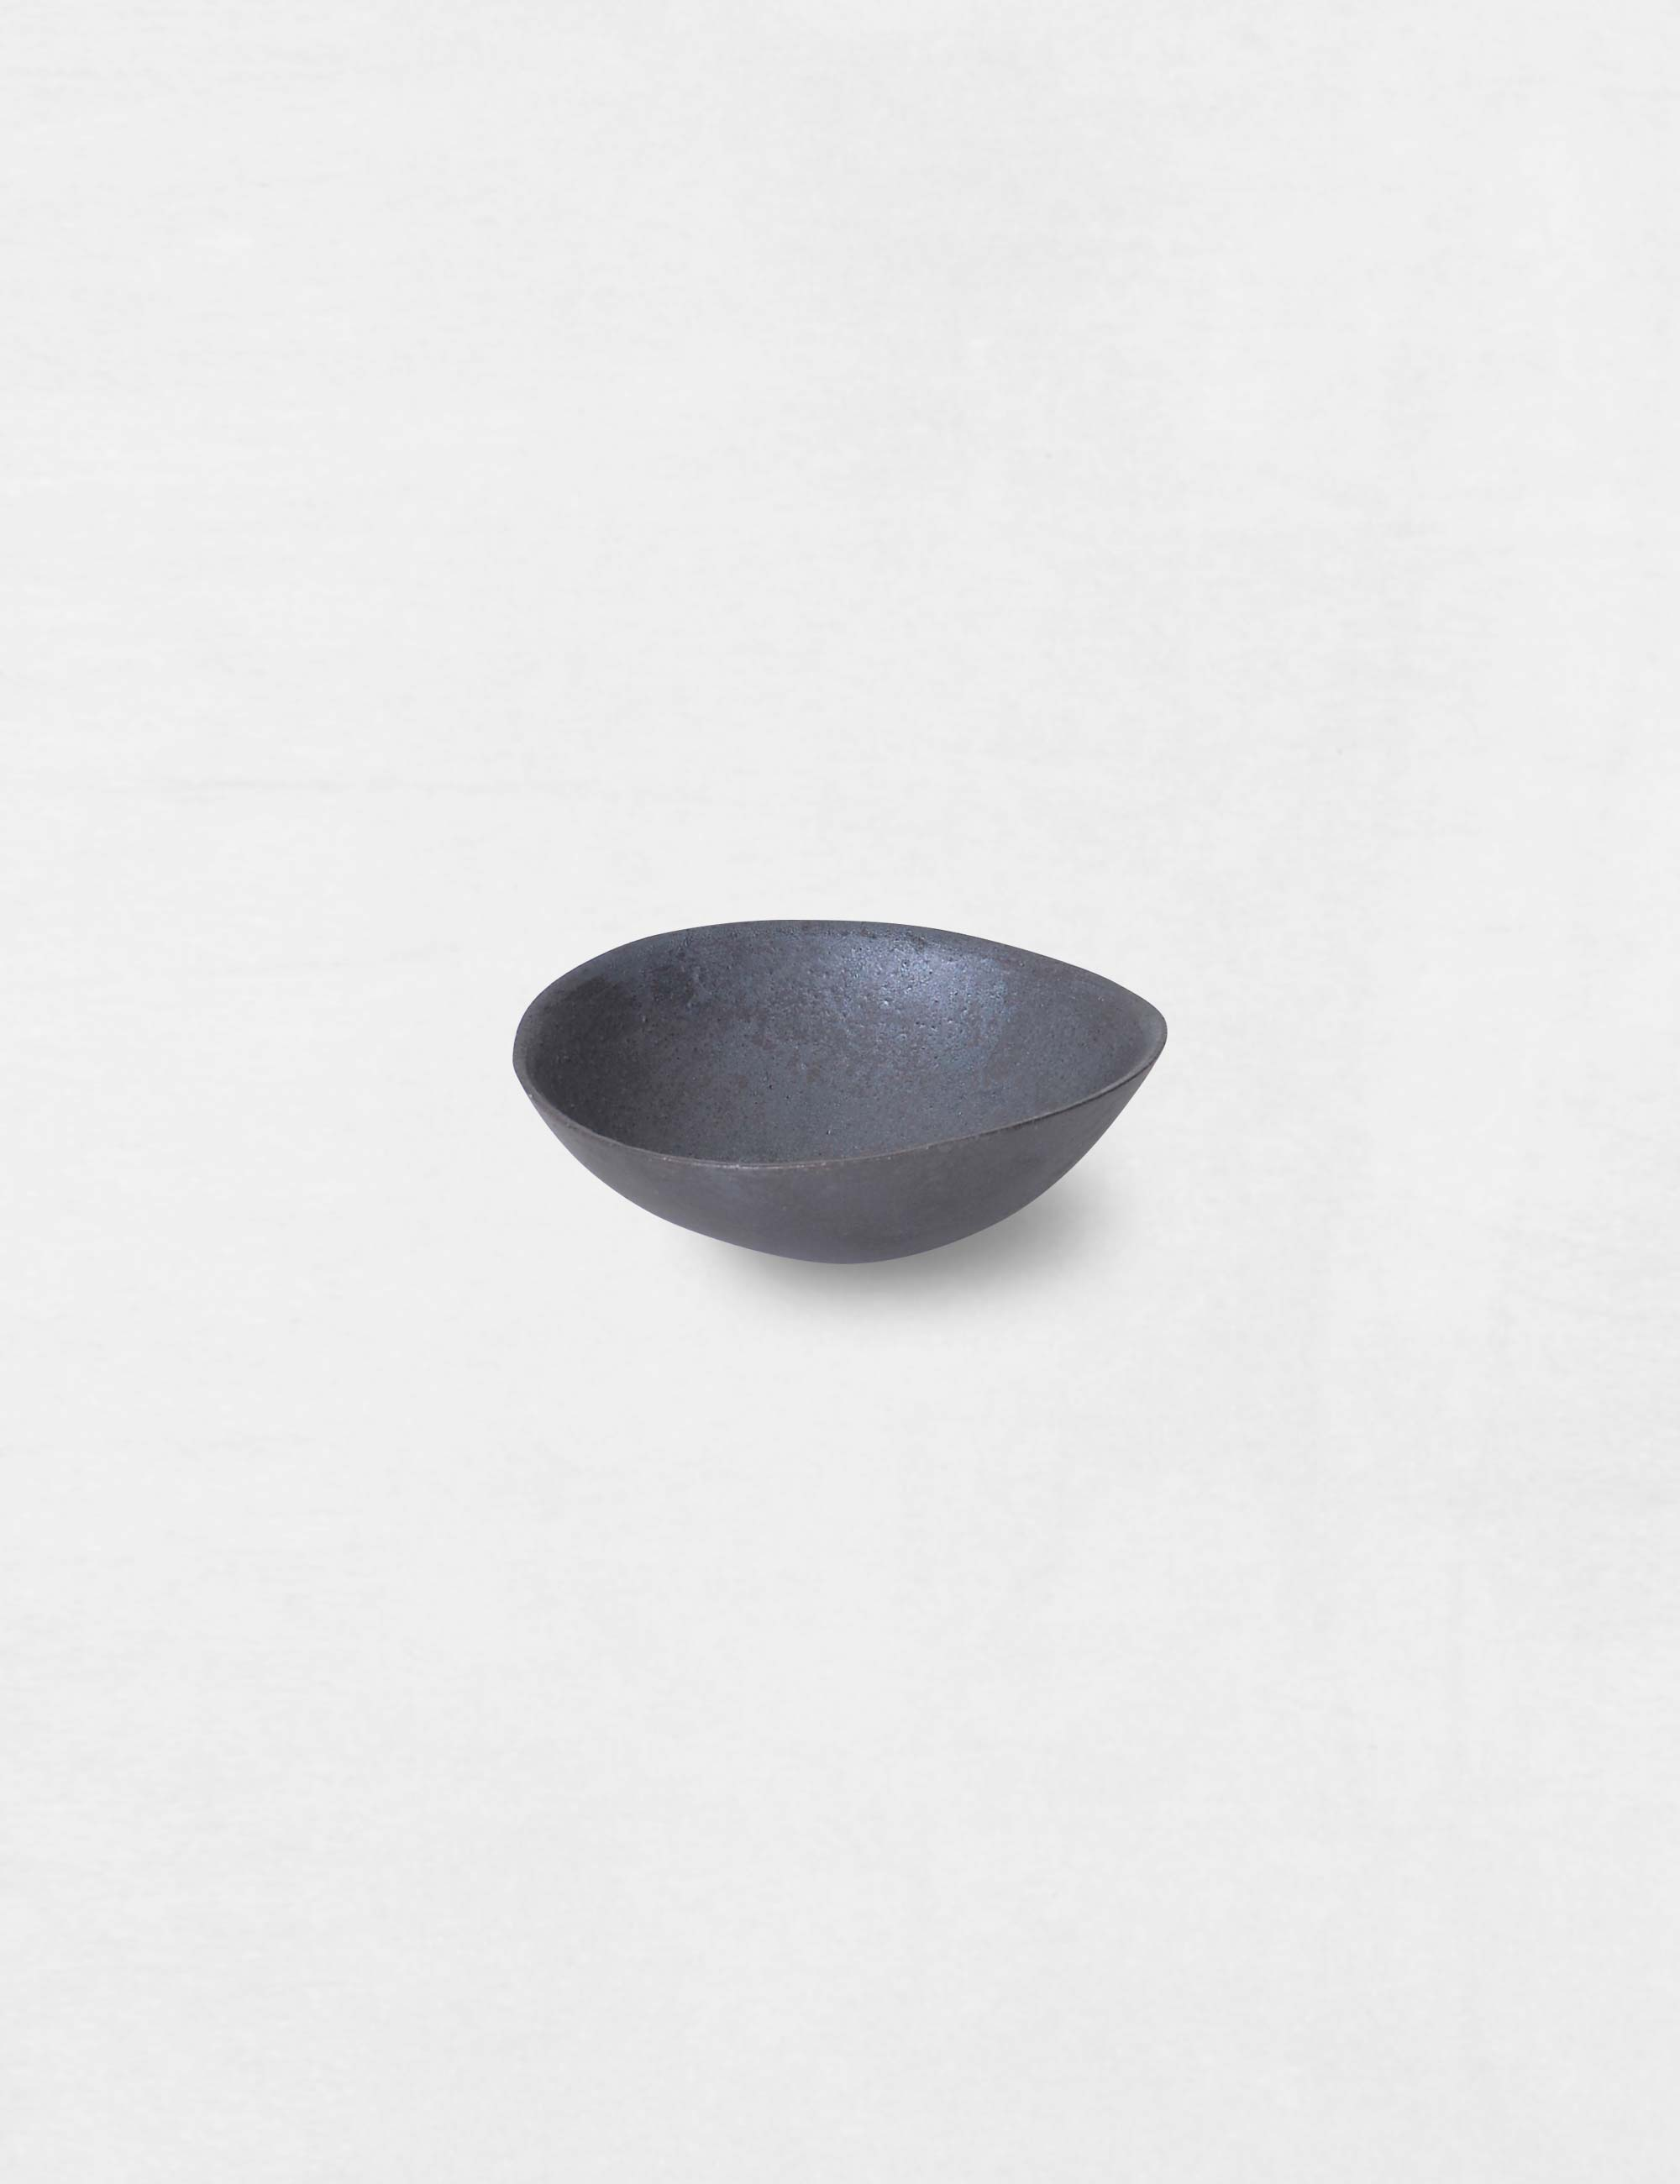 Jurgen Lehl Small Black Glaze Plate / Babaghuri